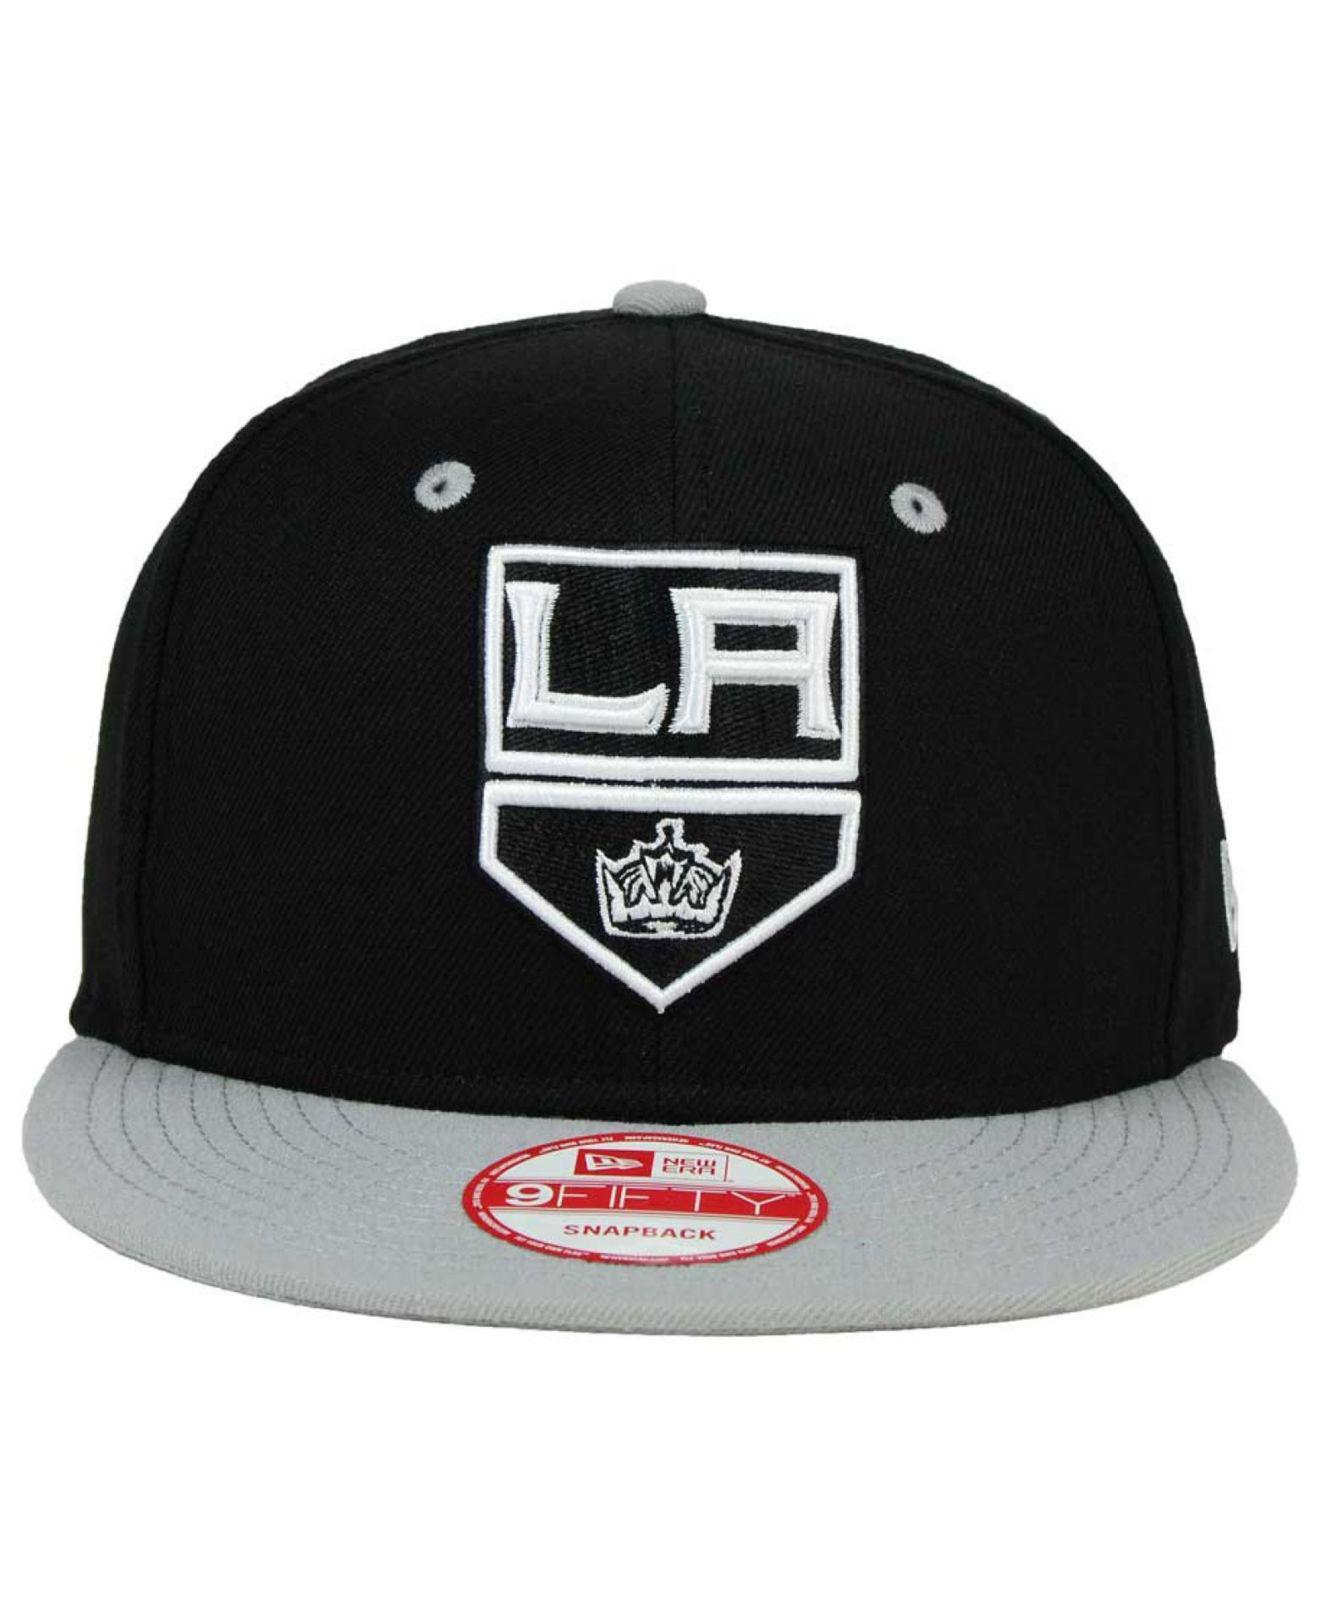 df5185d90d7 Lyst - Ktz Los Angeles Kings Black White Team Color 9fifty Snapback Cap in  Gray for Men